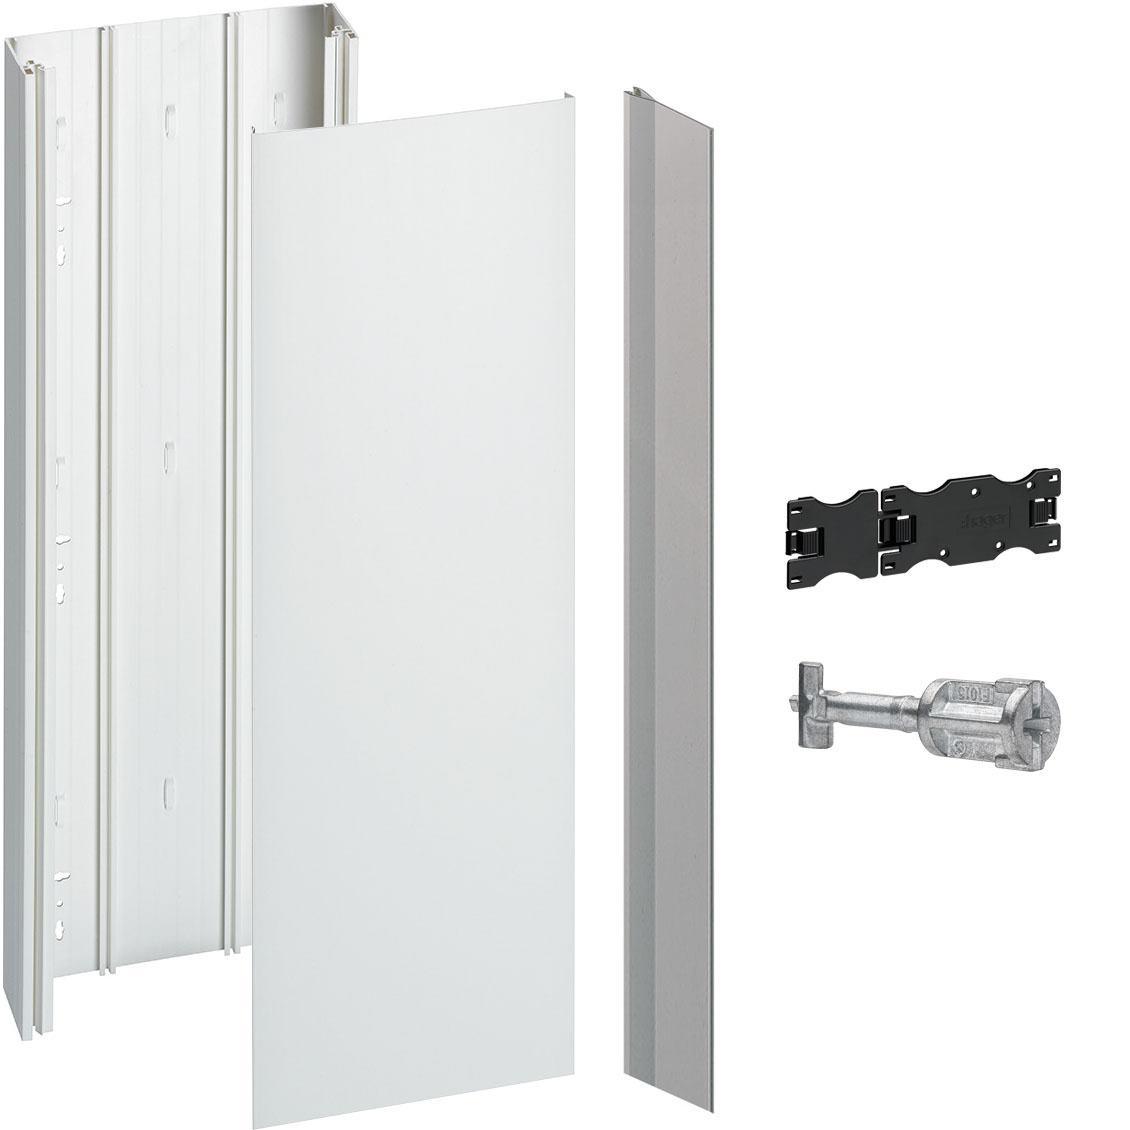 Accessoire GTL GAMMA+ 13 et 18 Hager